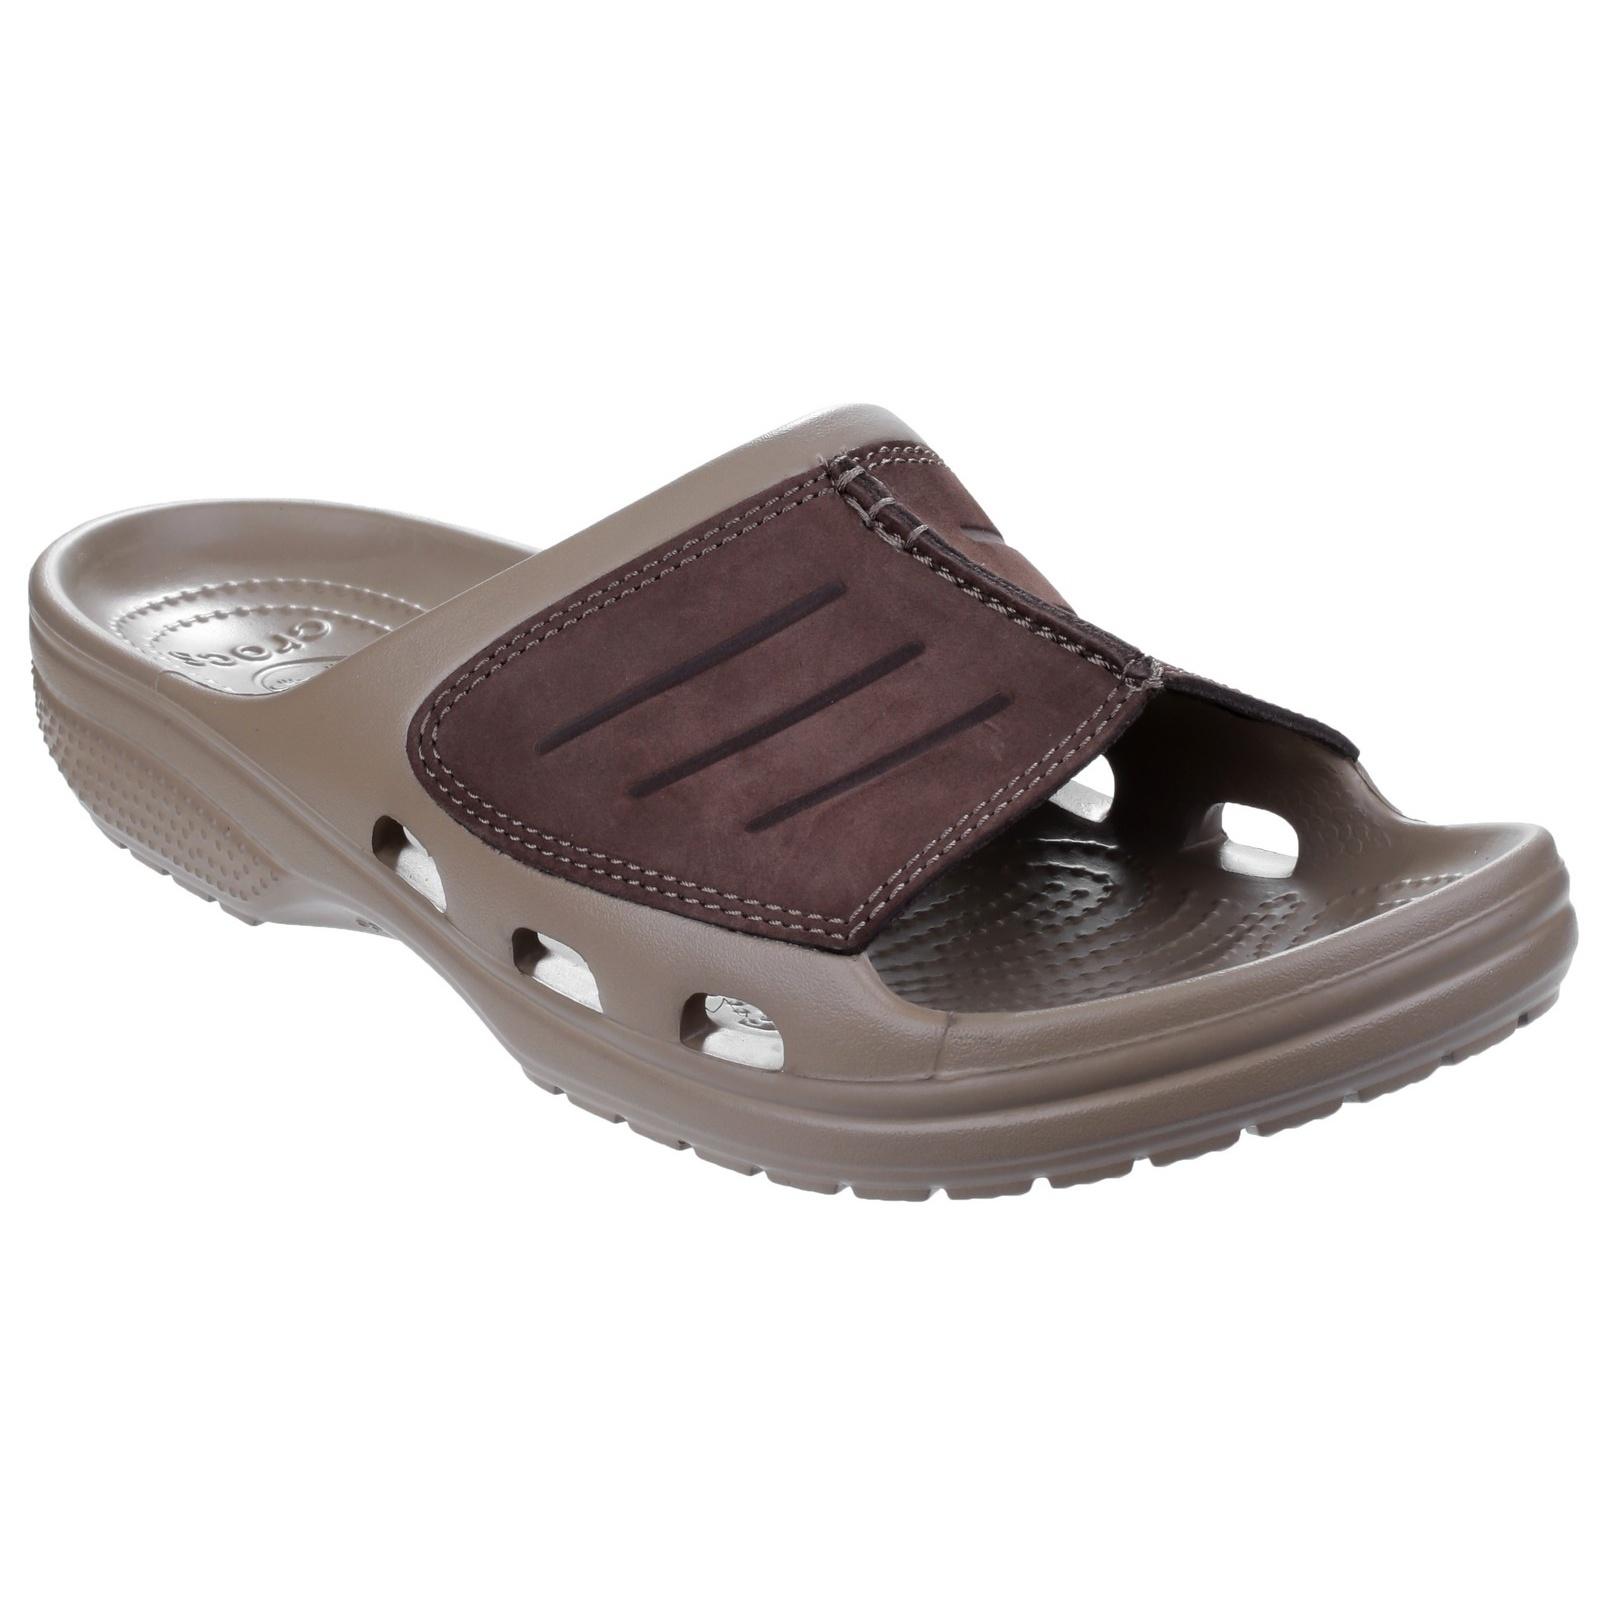 Crocs Mens Yukon Mesa Flip Flops/Sandals | eBay - photo#18